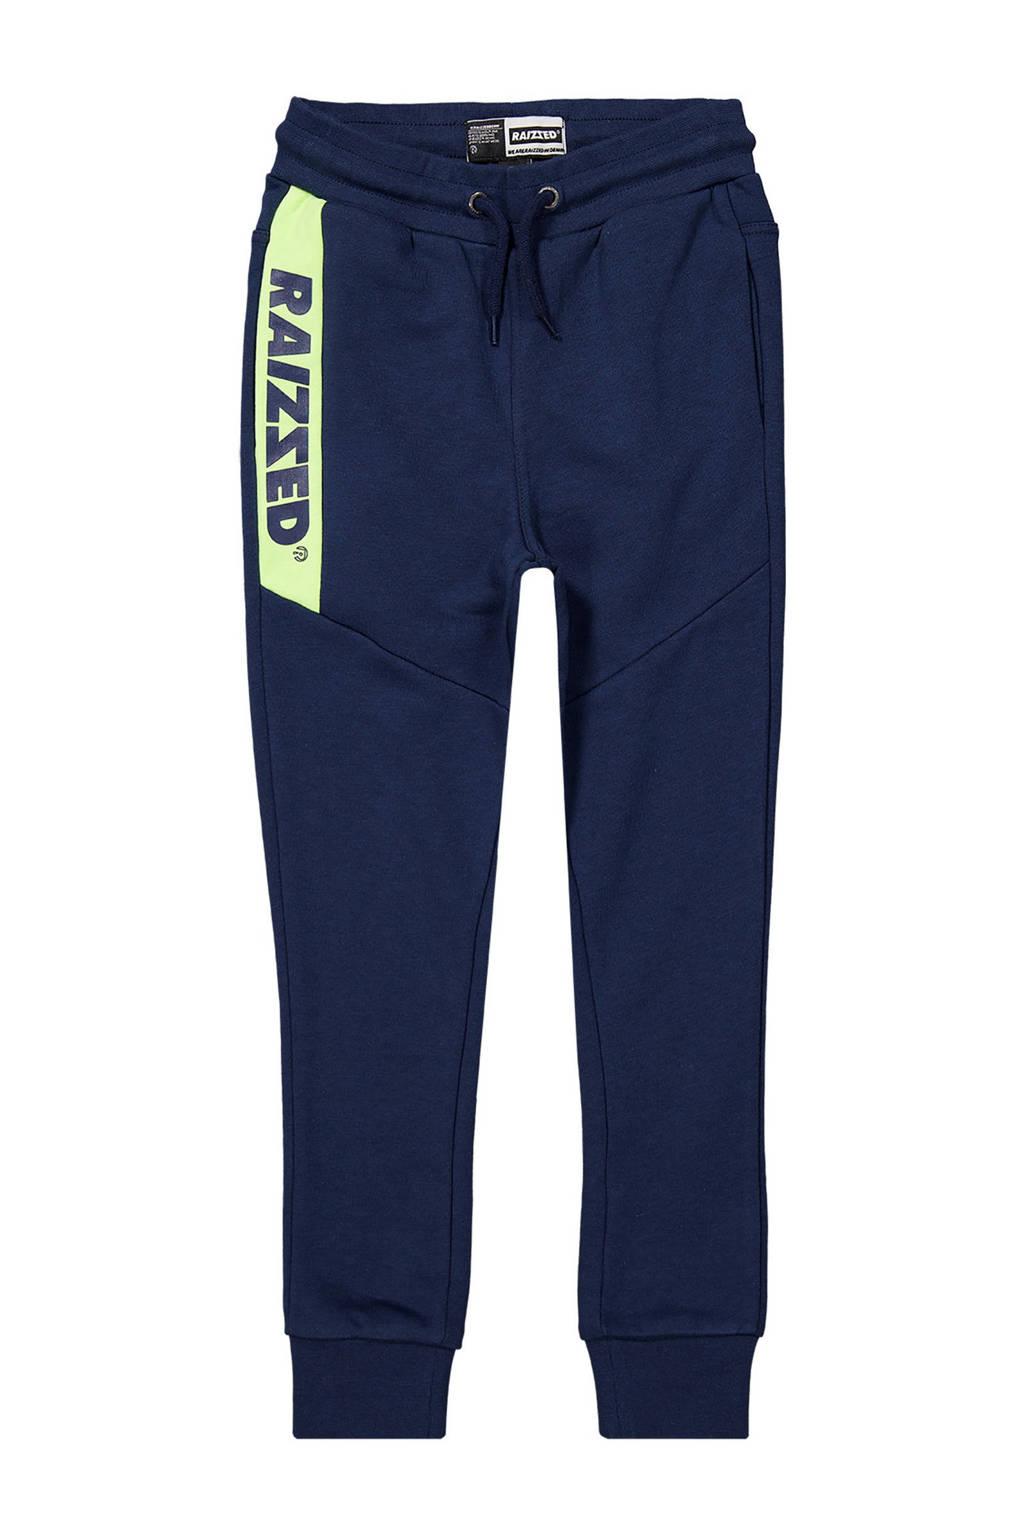 Raizzed skinny joggingbroek Pete met logo donkerblauw, Donkerblauw